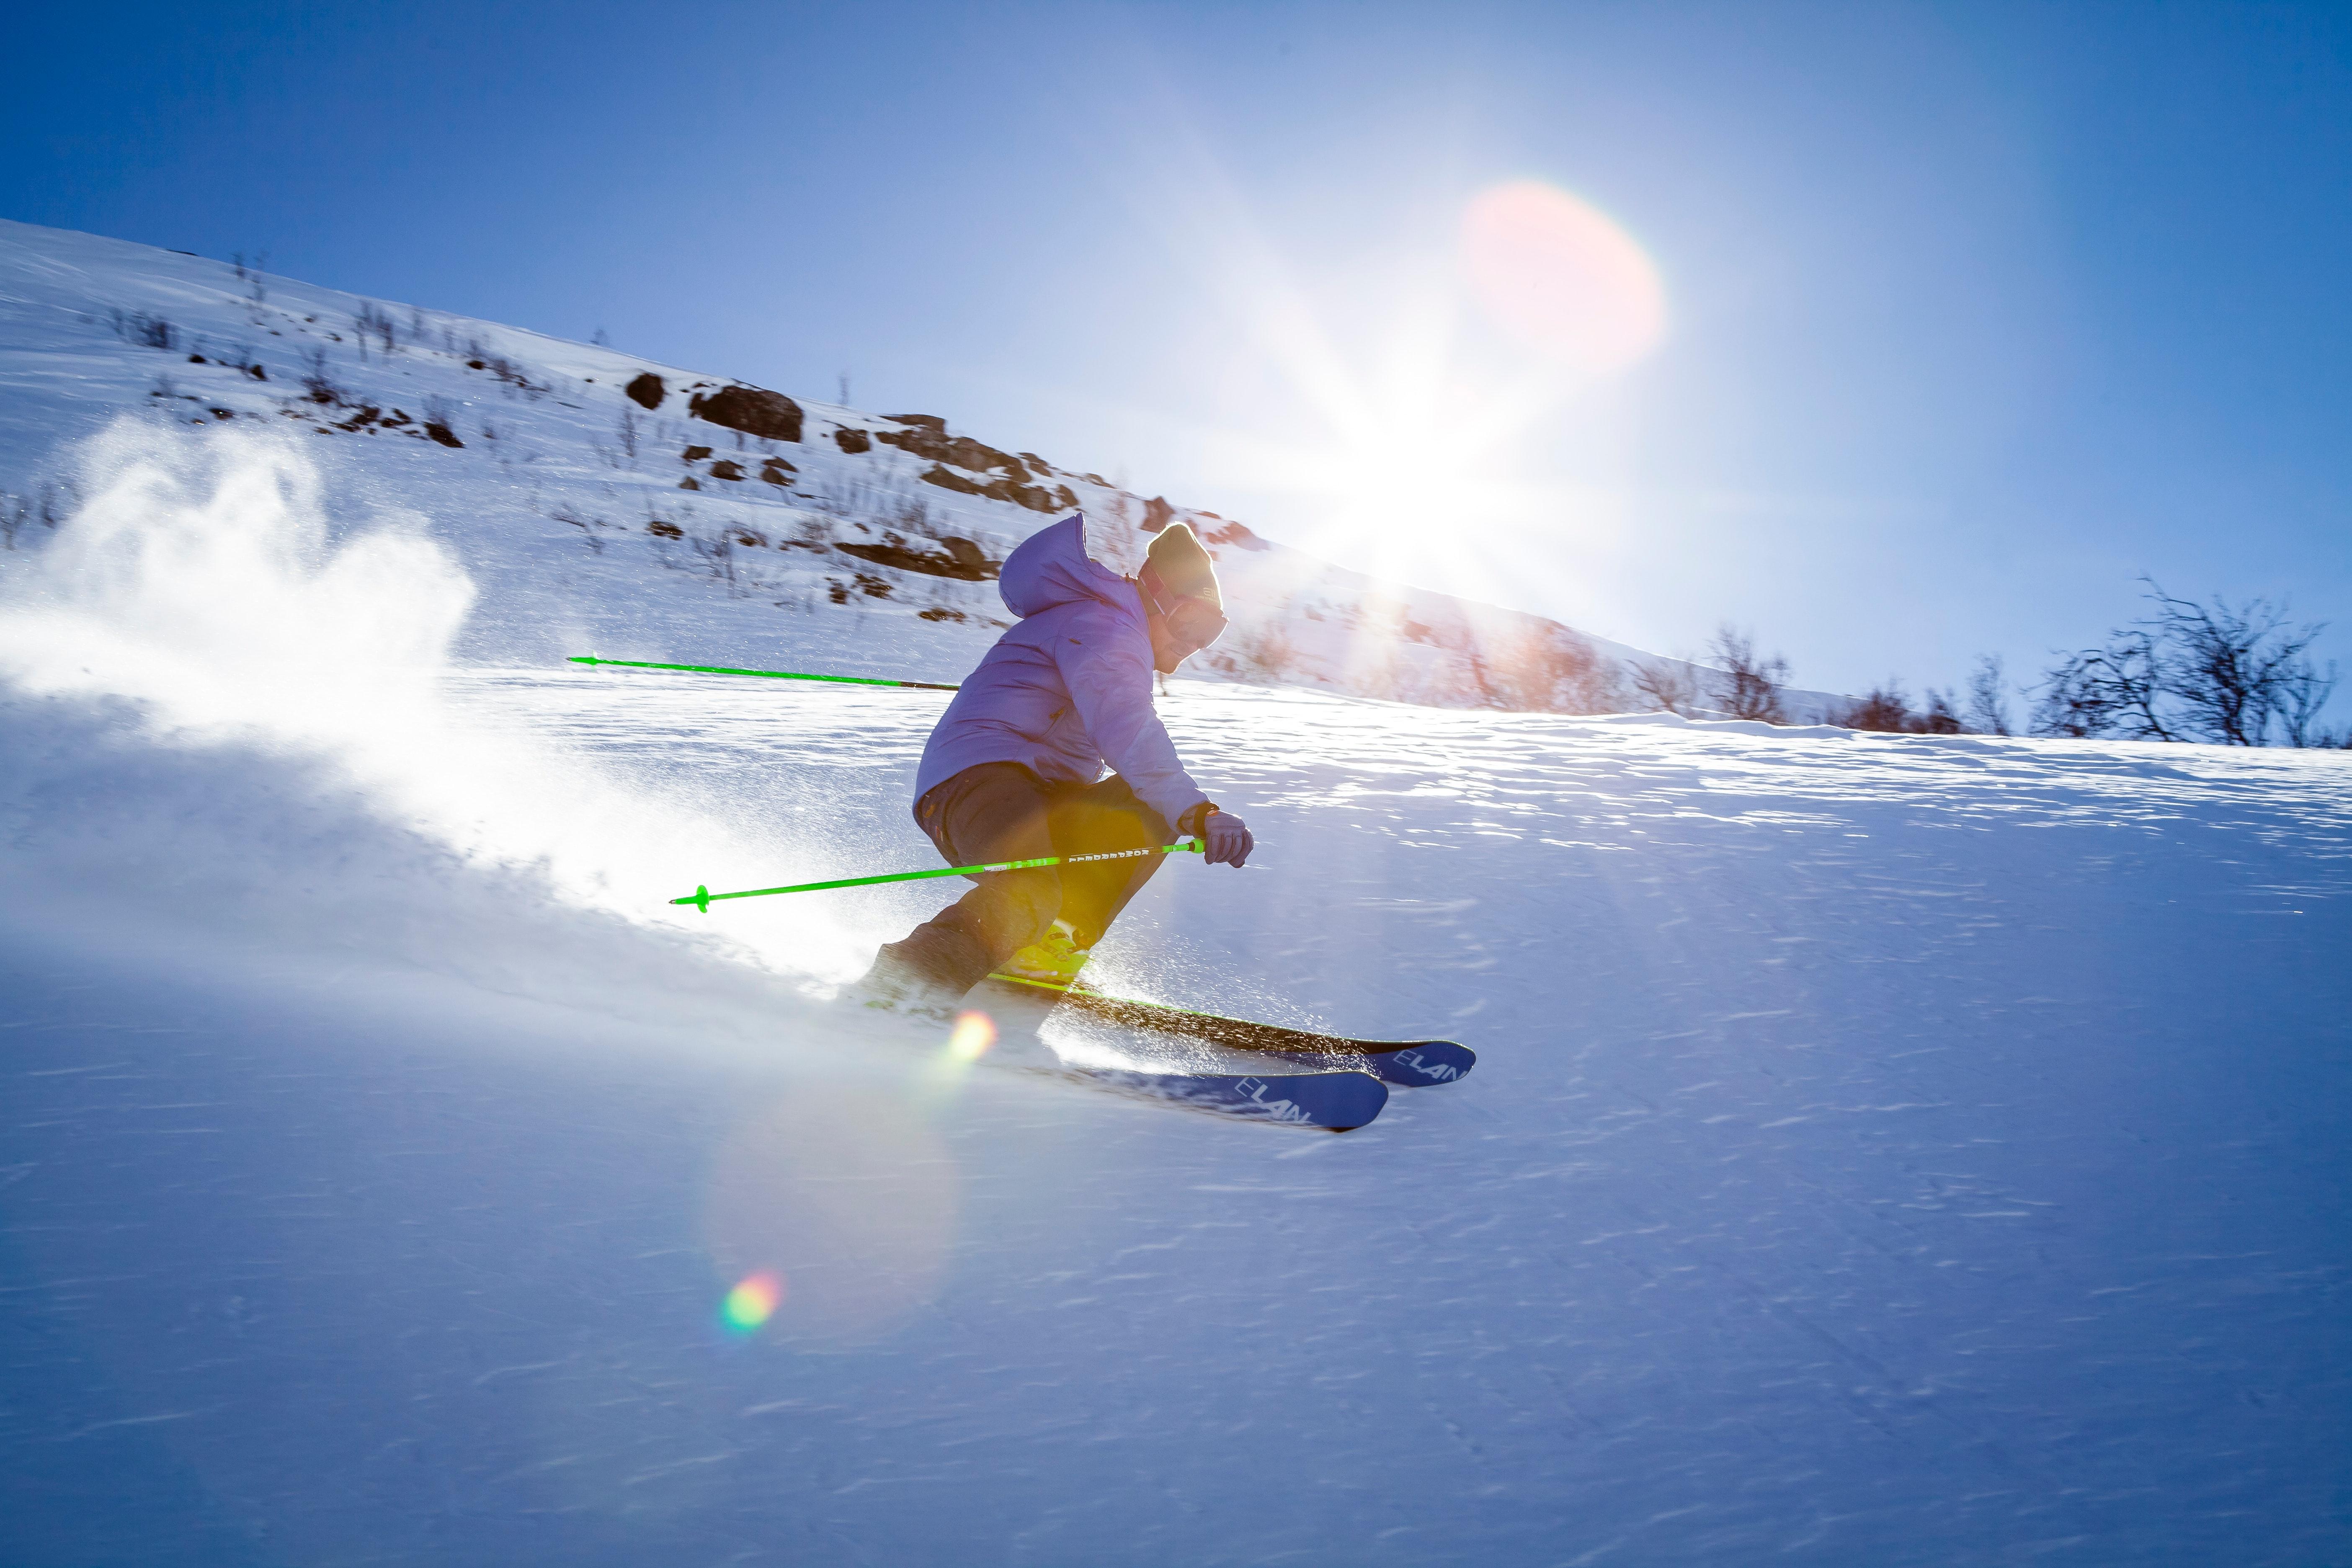 K2 ski og Roxa skistøvler til priser under markedsniveau